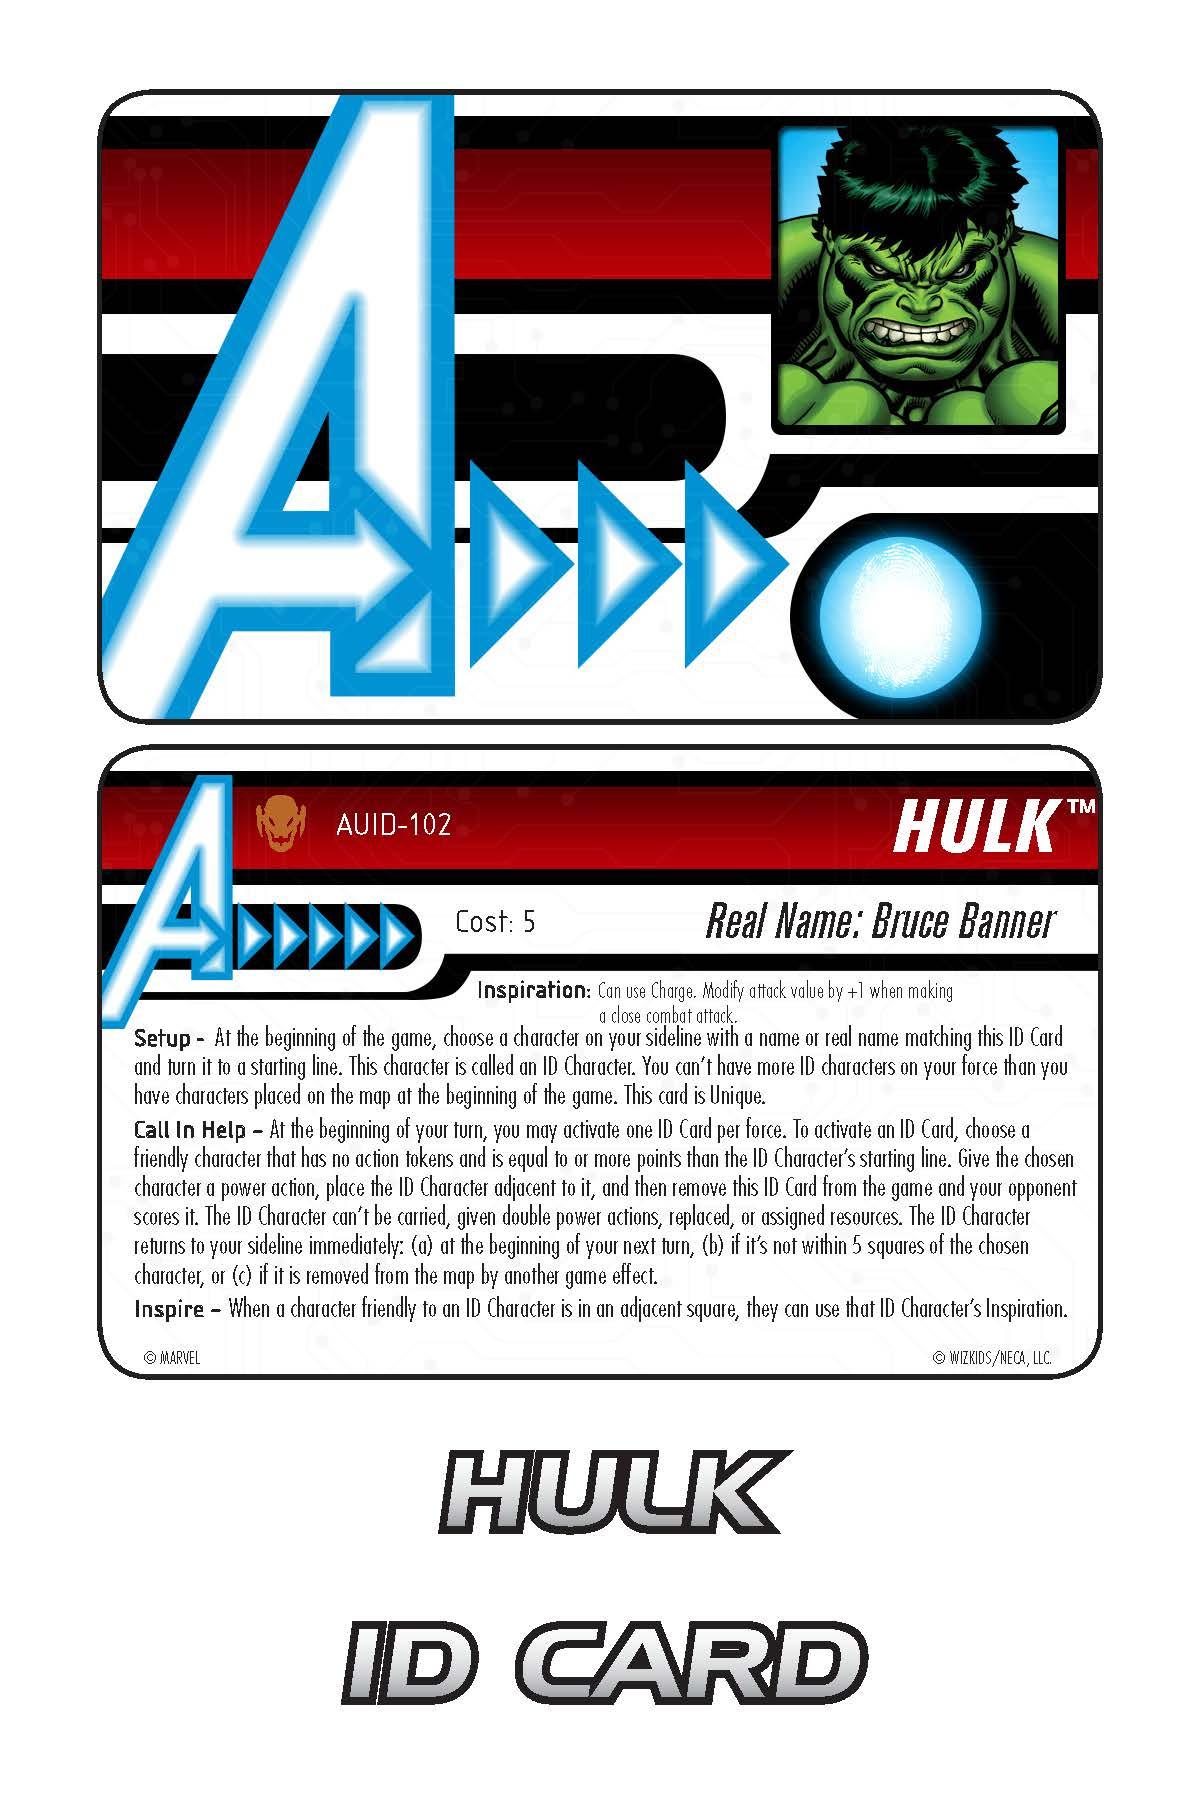 Marvel HeroClix: Avengers ID Card- Hulk